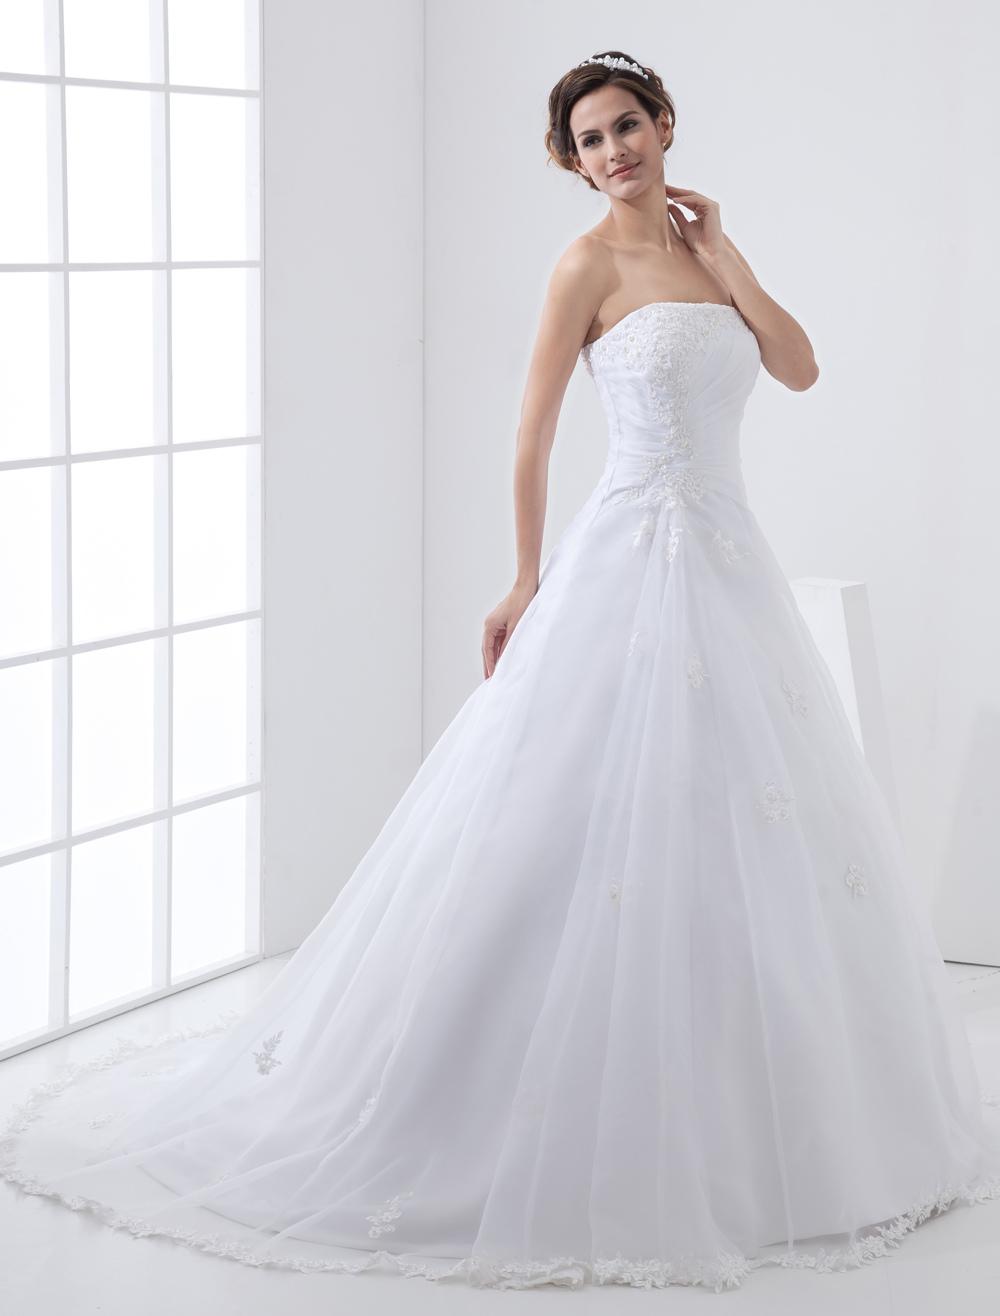 robe de mari e princesse 2018 robes de mari e blanche bretelles robe de mari e en dentelle. Black Bedroom Furniture Sets. Home Design Ideas